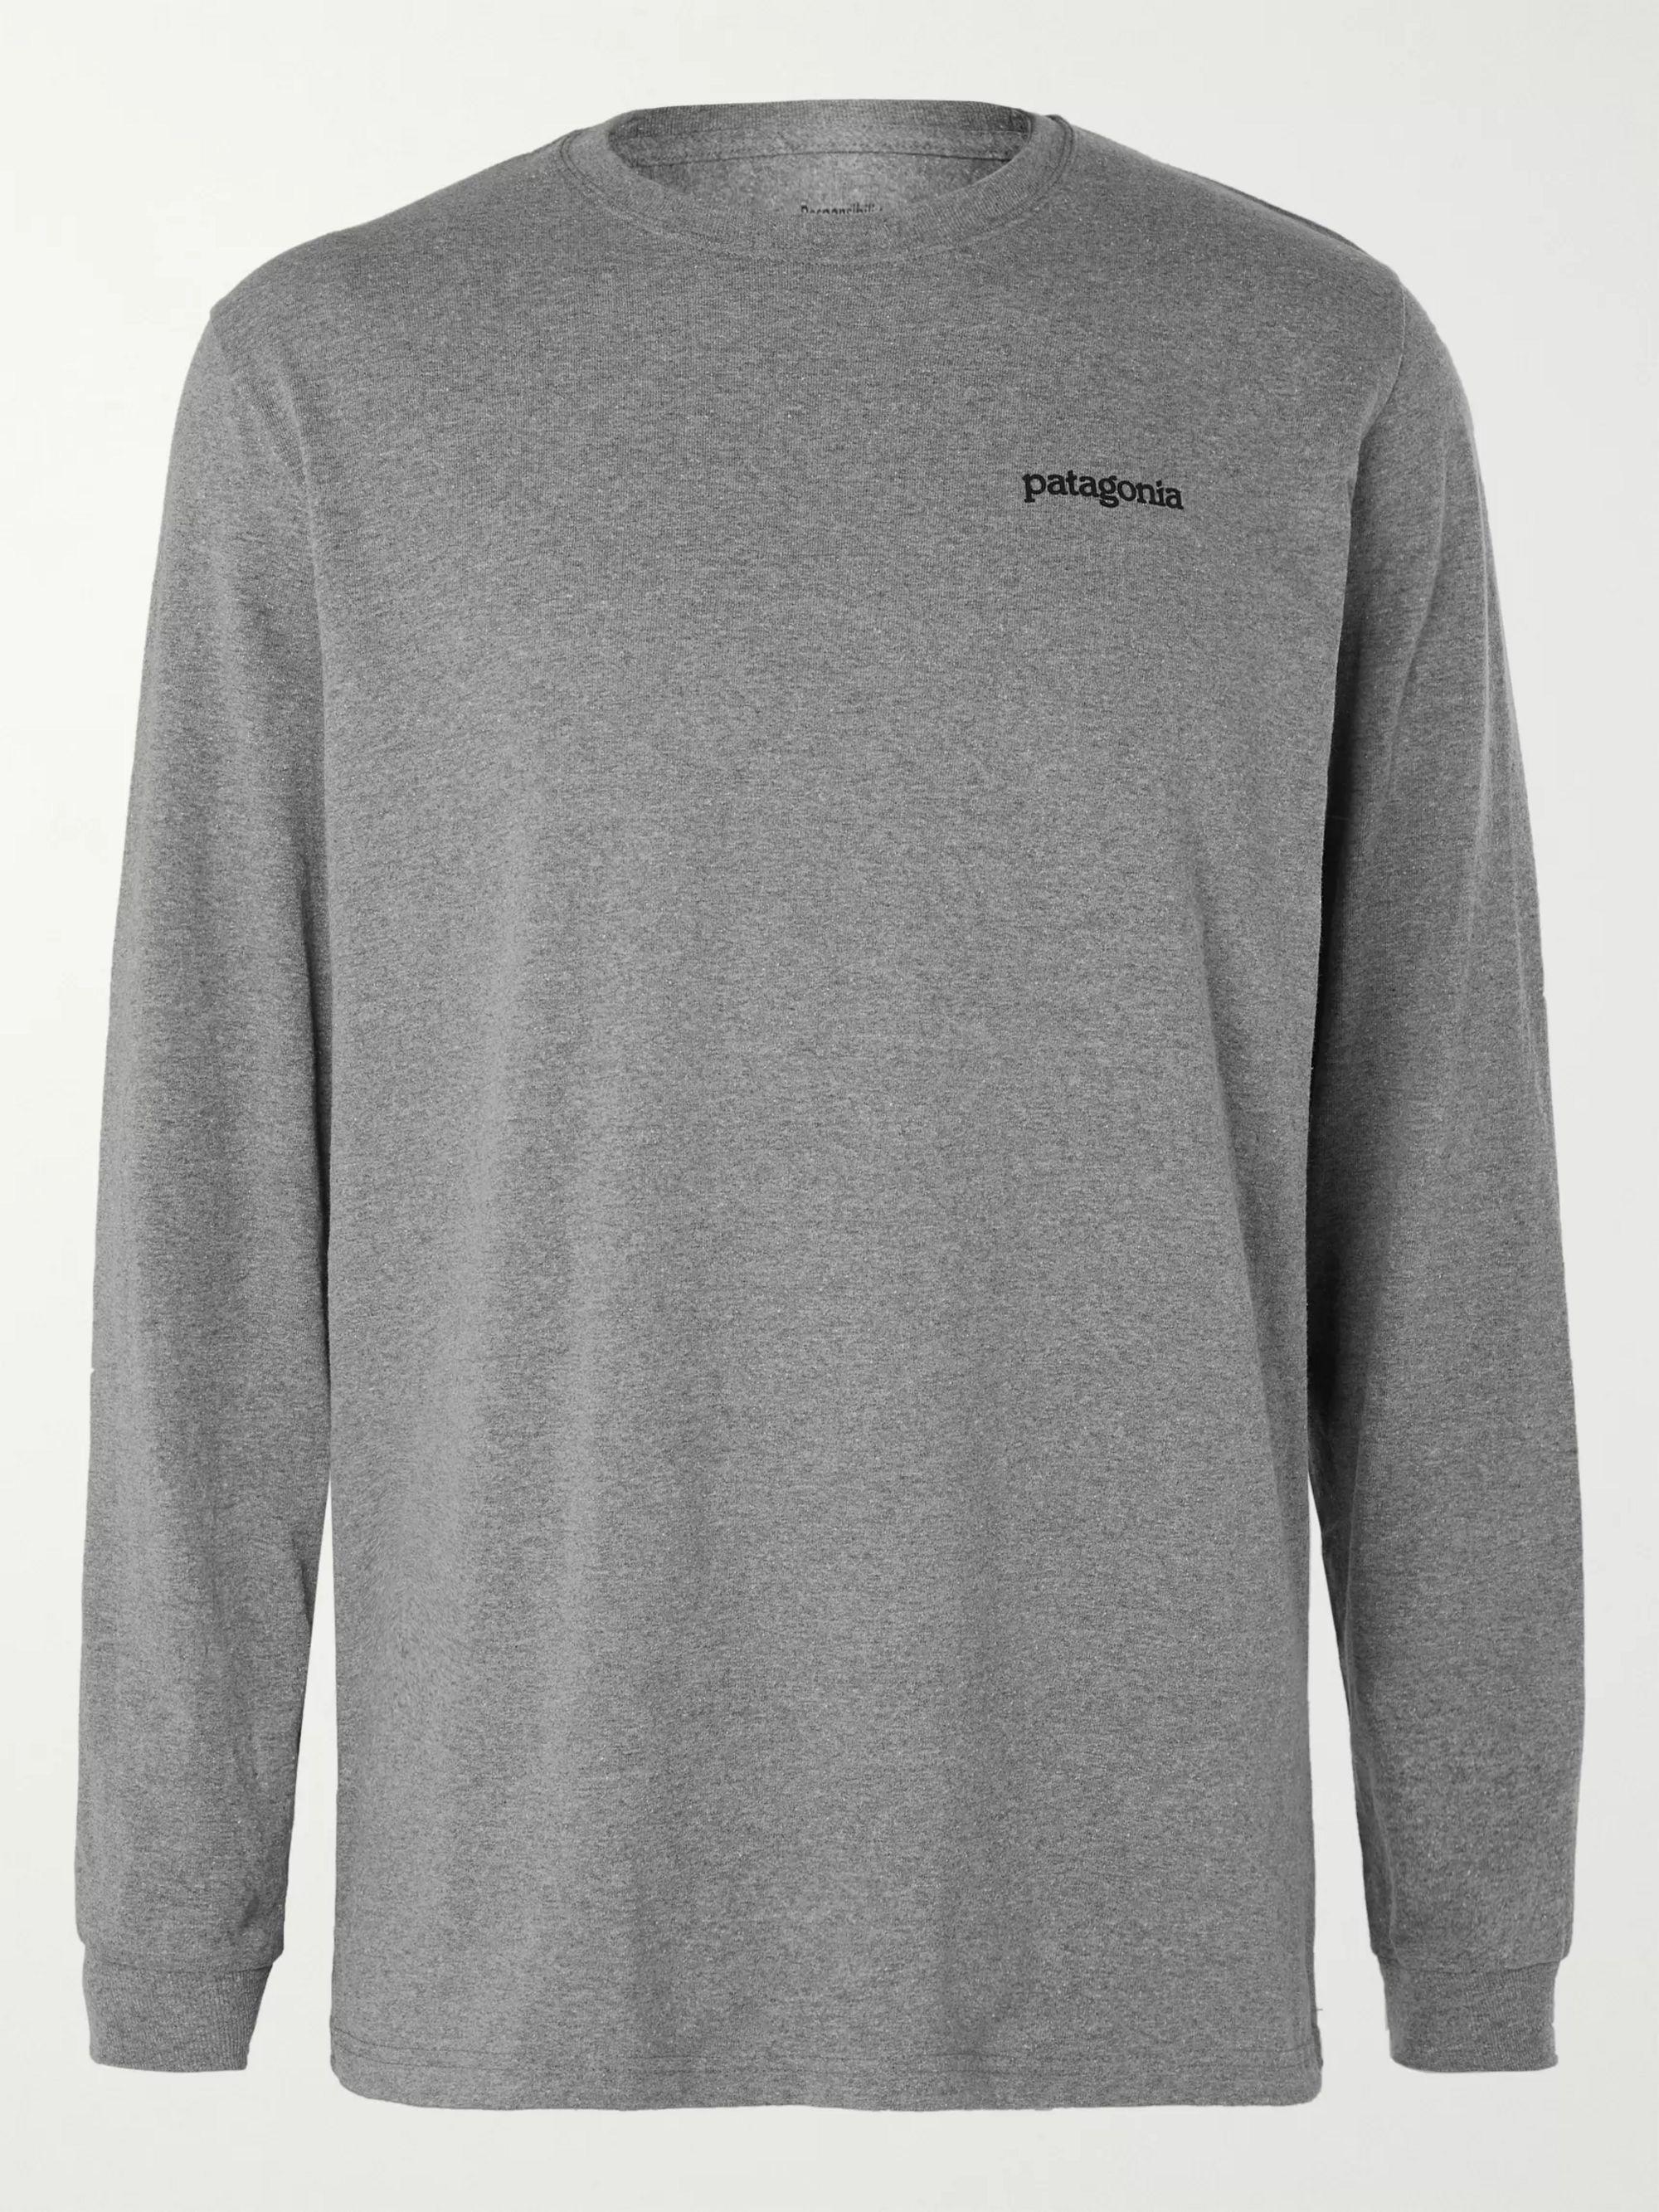 Fitz Roy Horizons Logo Responsibili Tee Printed Cotton Blend Jersey T Shirt by Patagonia